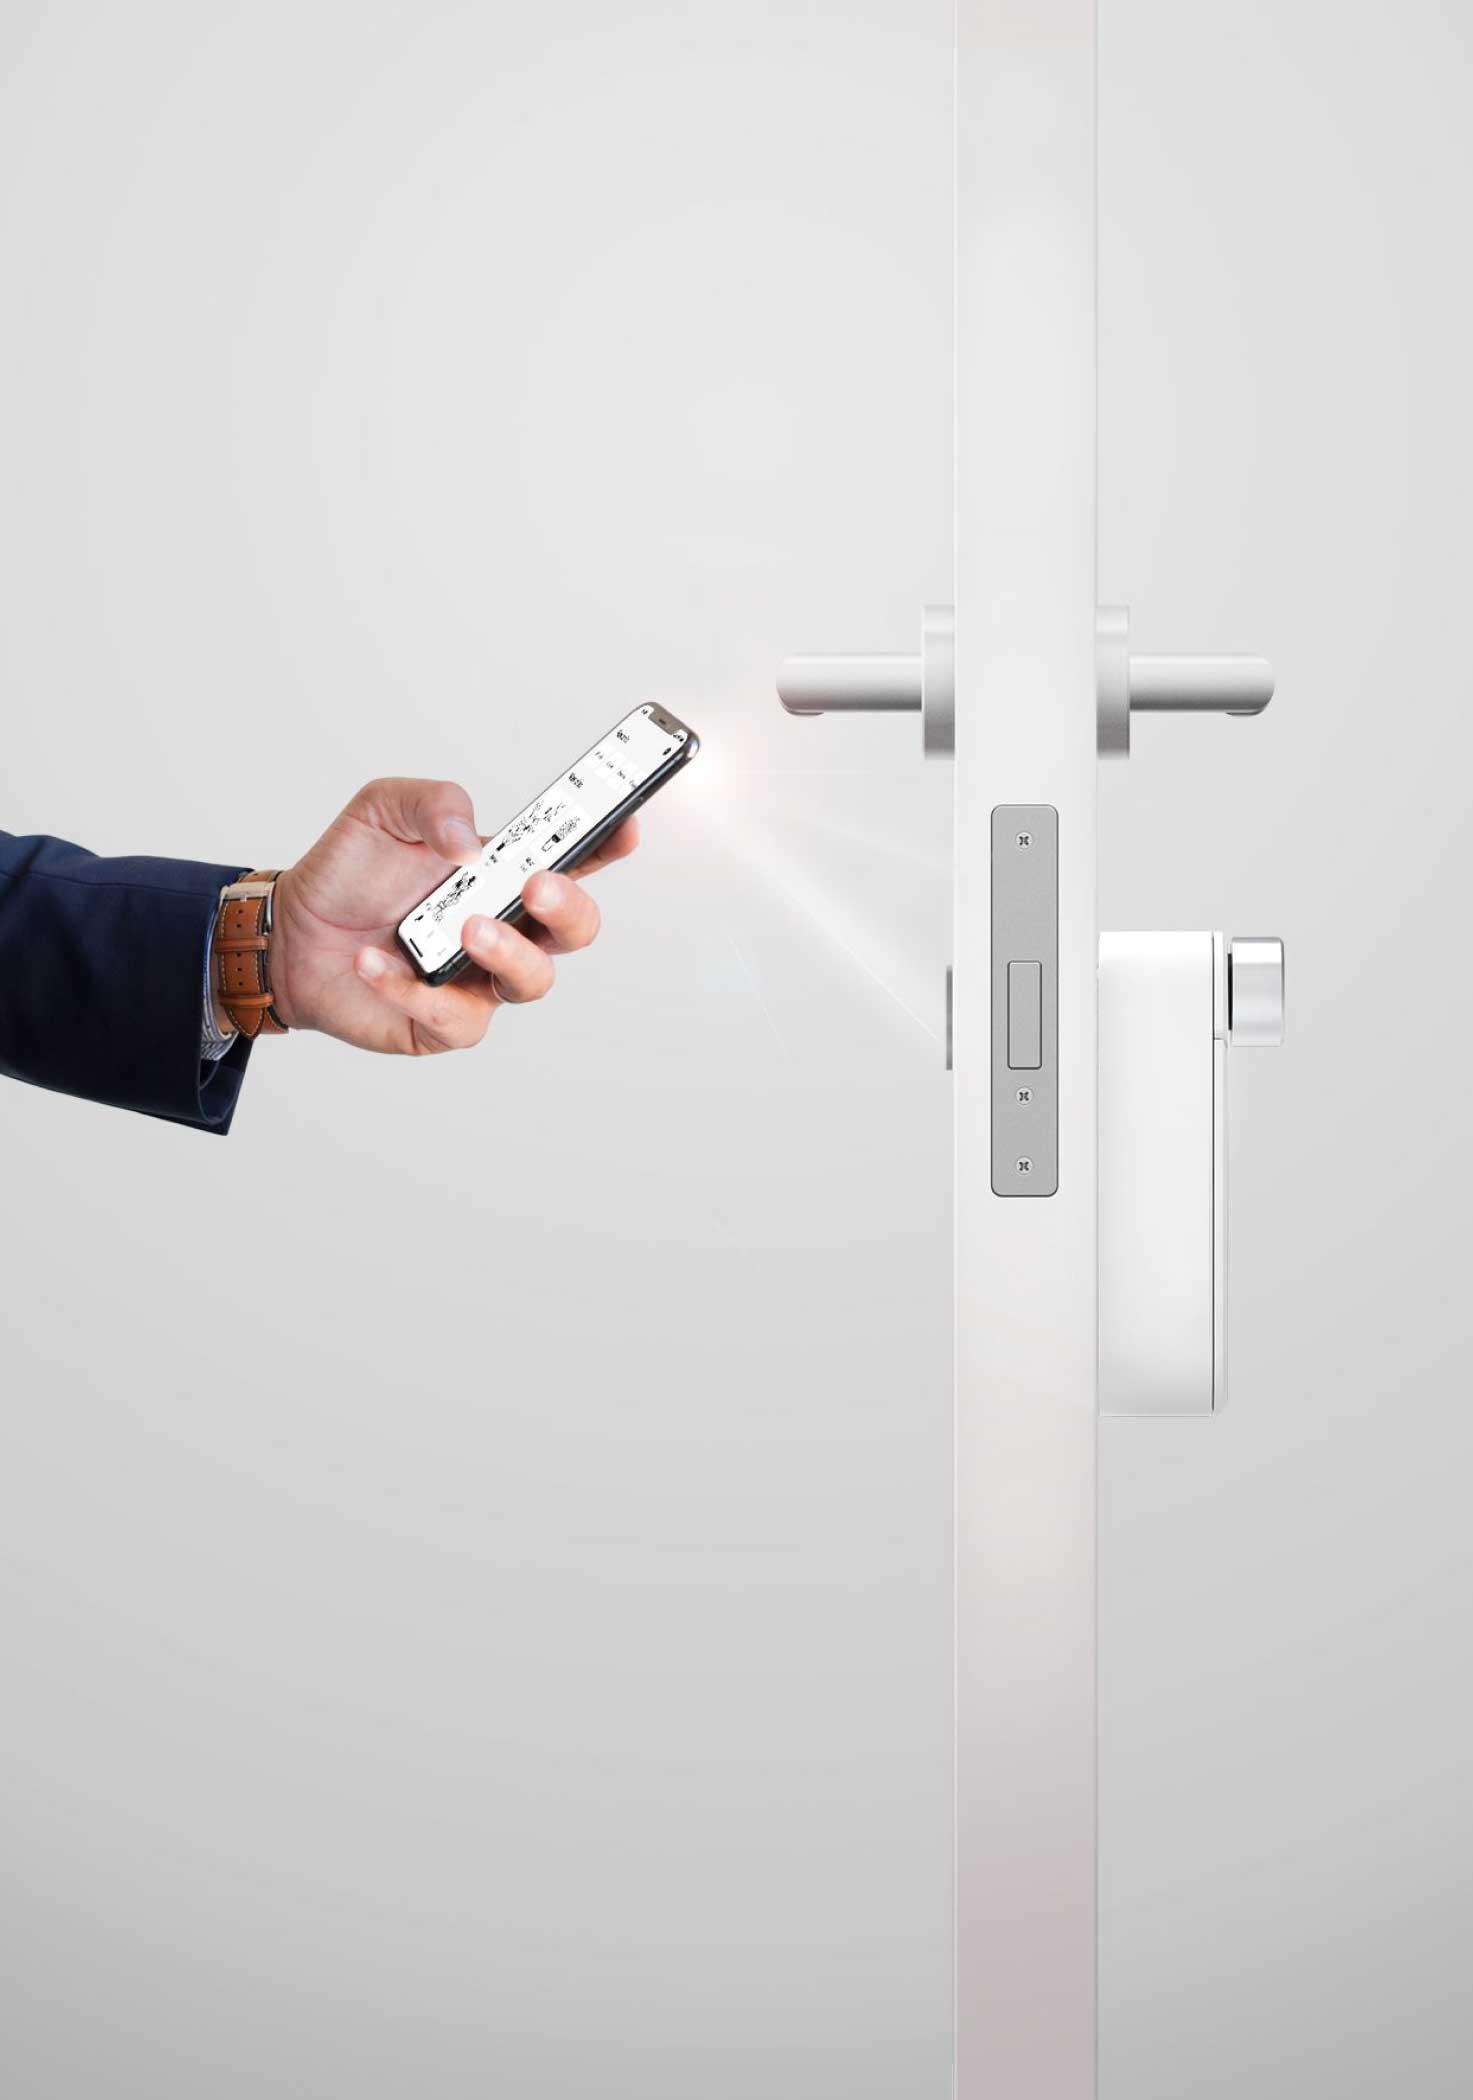 Man using smartphone to flash the BrightLock smart lock